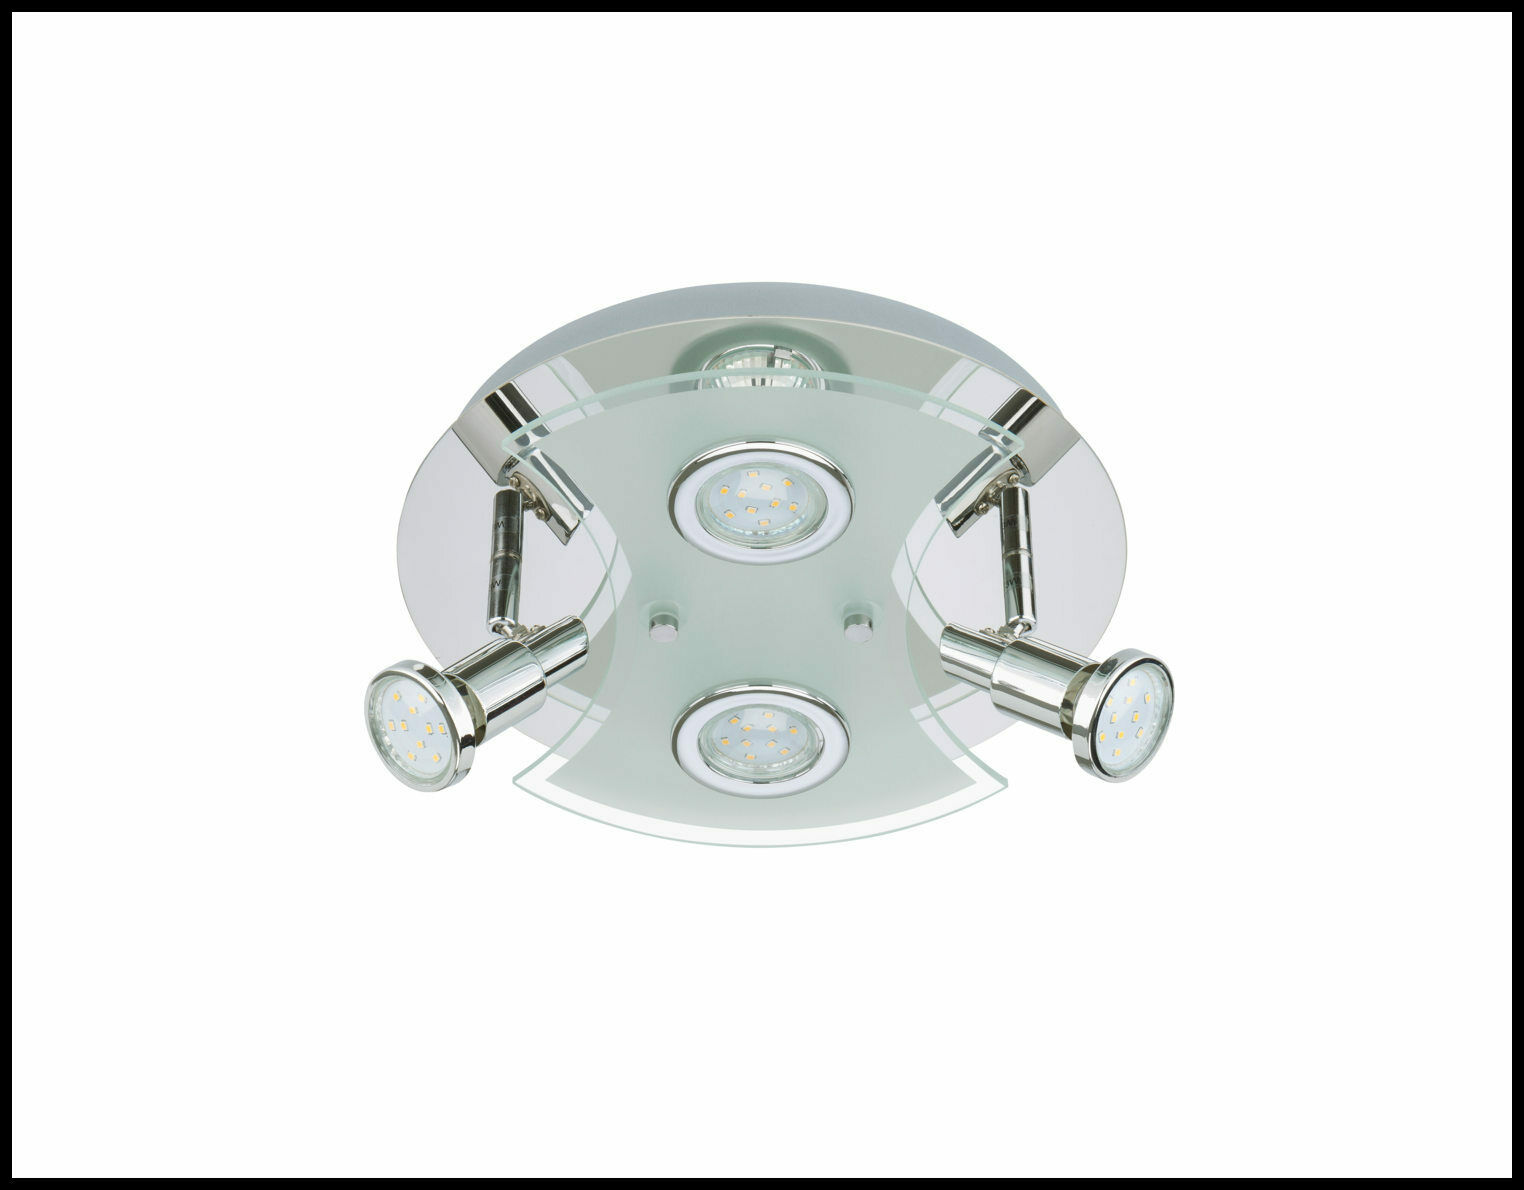 ♥ 4Fl. LED Deckenleuchte Deckenlampe 12W 1000lm Chrom 3528-048 A+